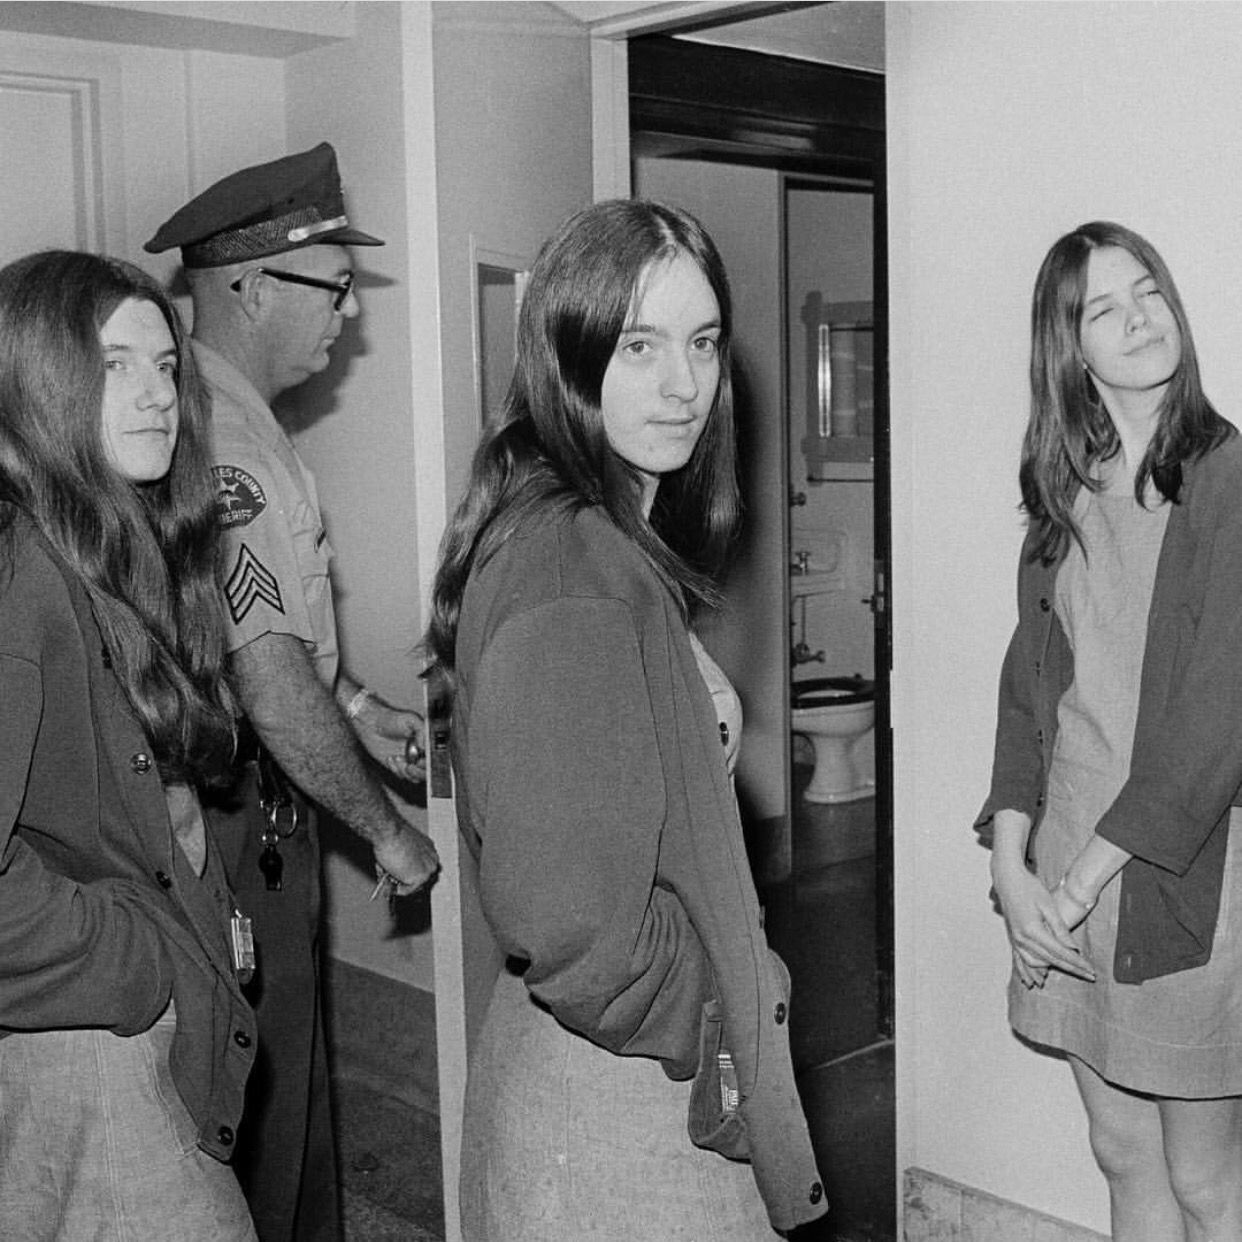 Manson girls | Helter Skelter | Charles manson, Leslie van